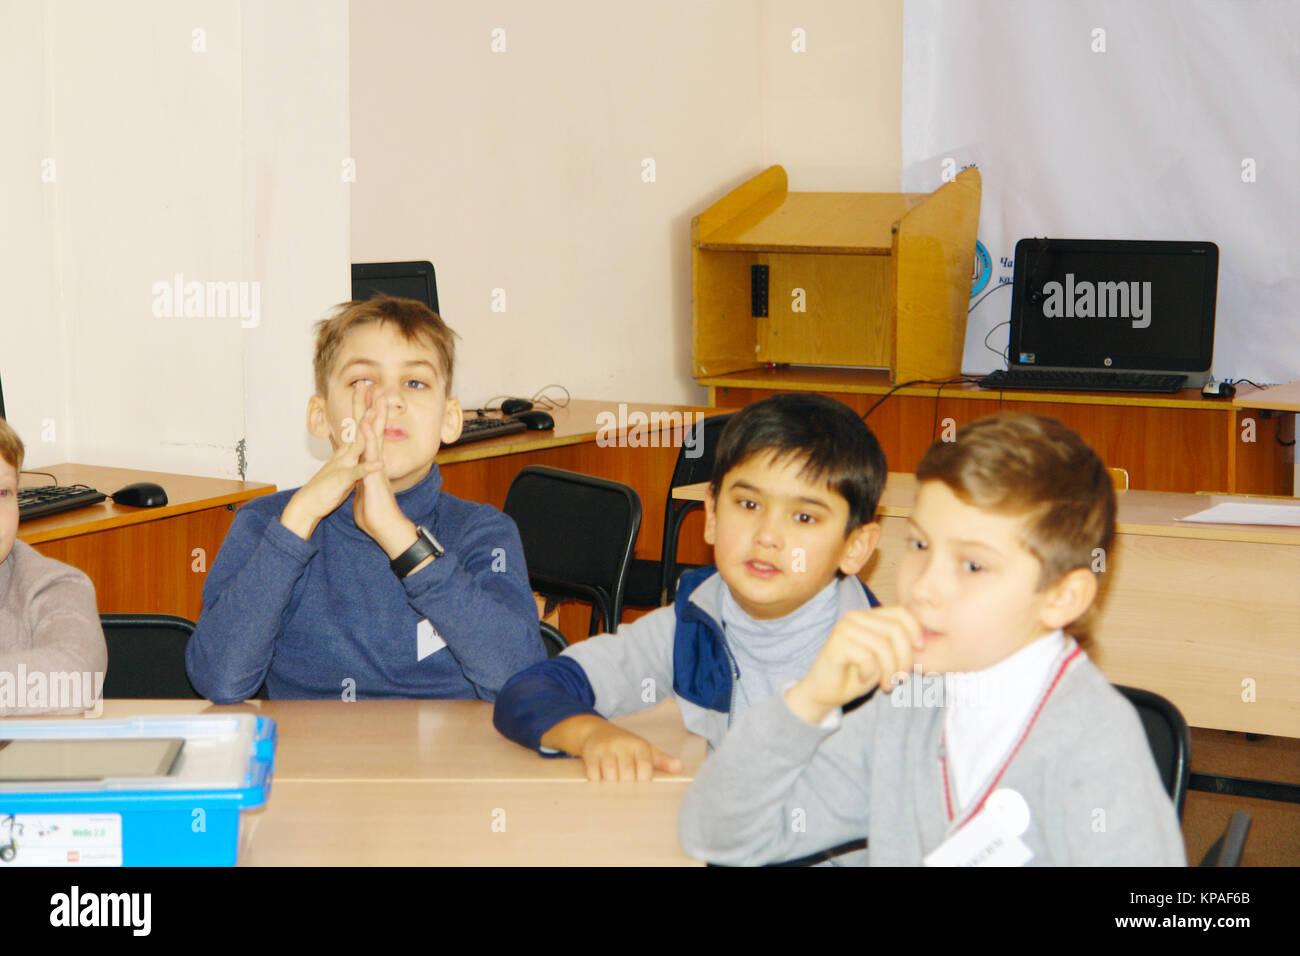 School kids in class - Stock Image